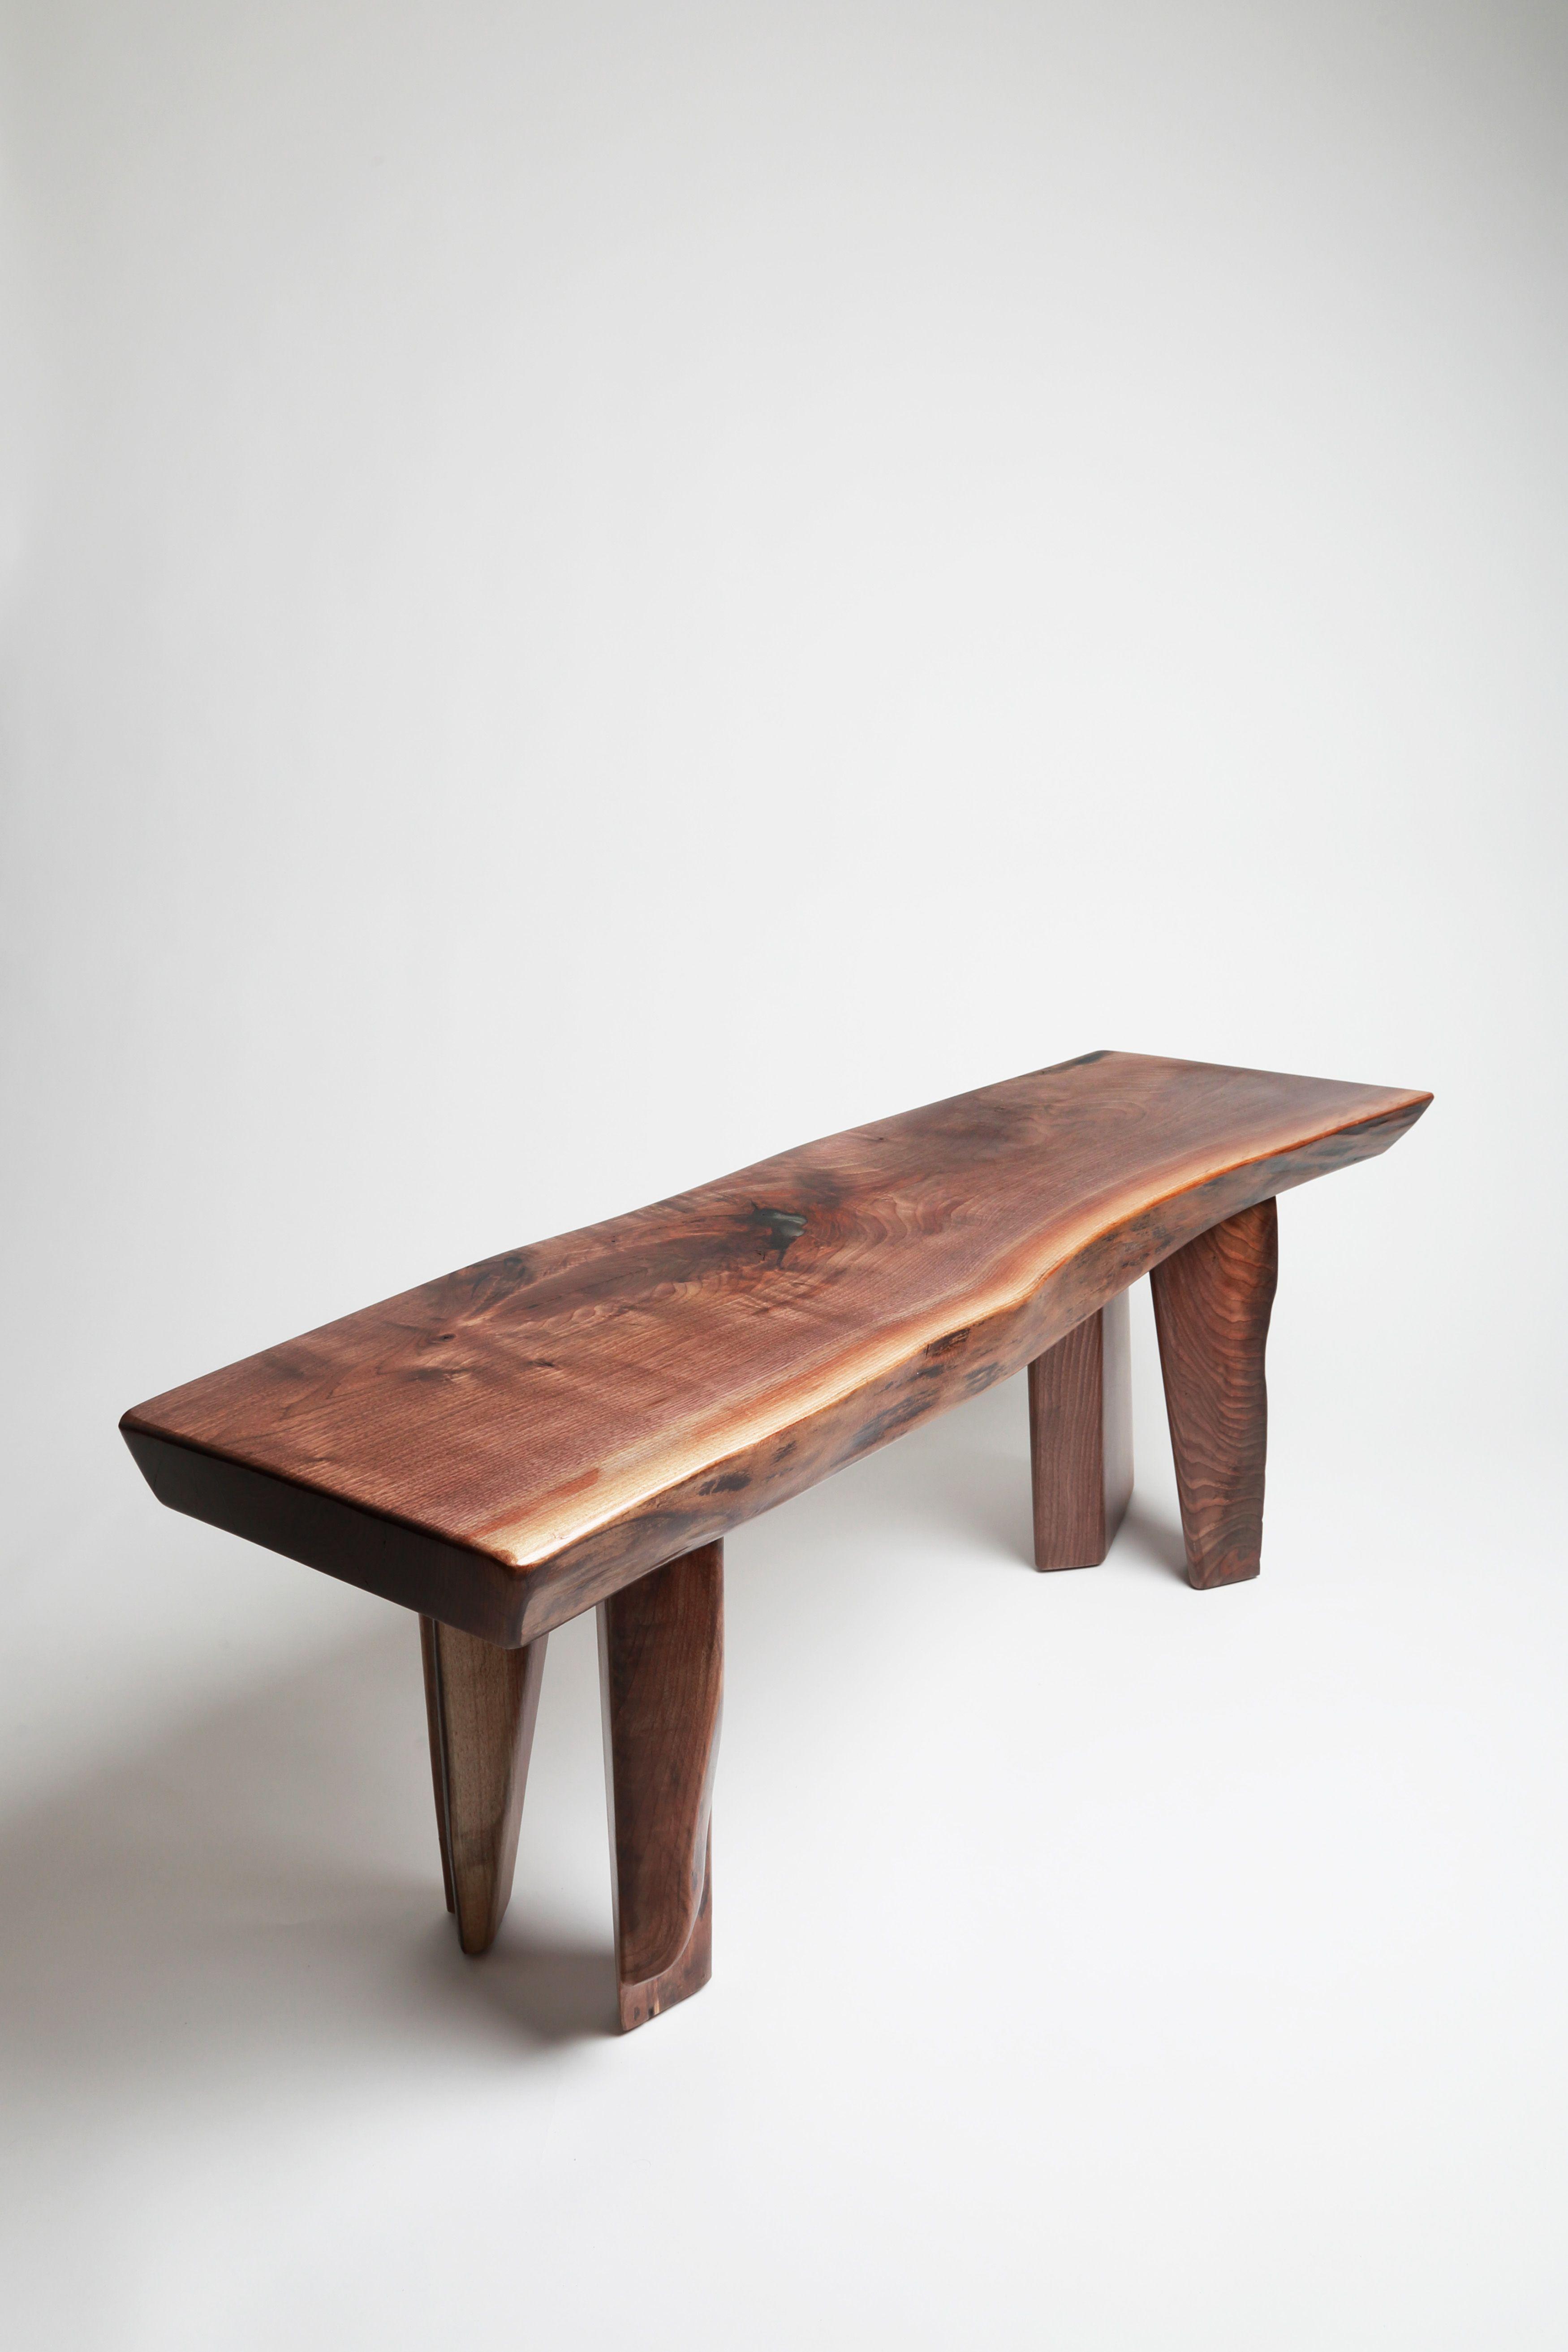 Custom Built Solid Wood Table Allendale Construction Solid Wood Table Solid Wood Wood [ 5250 x 3500 Pixel ]